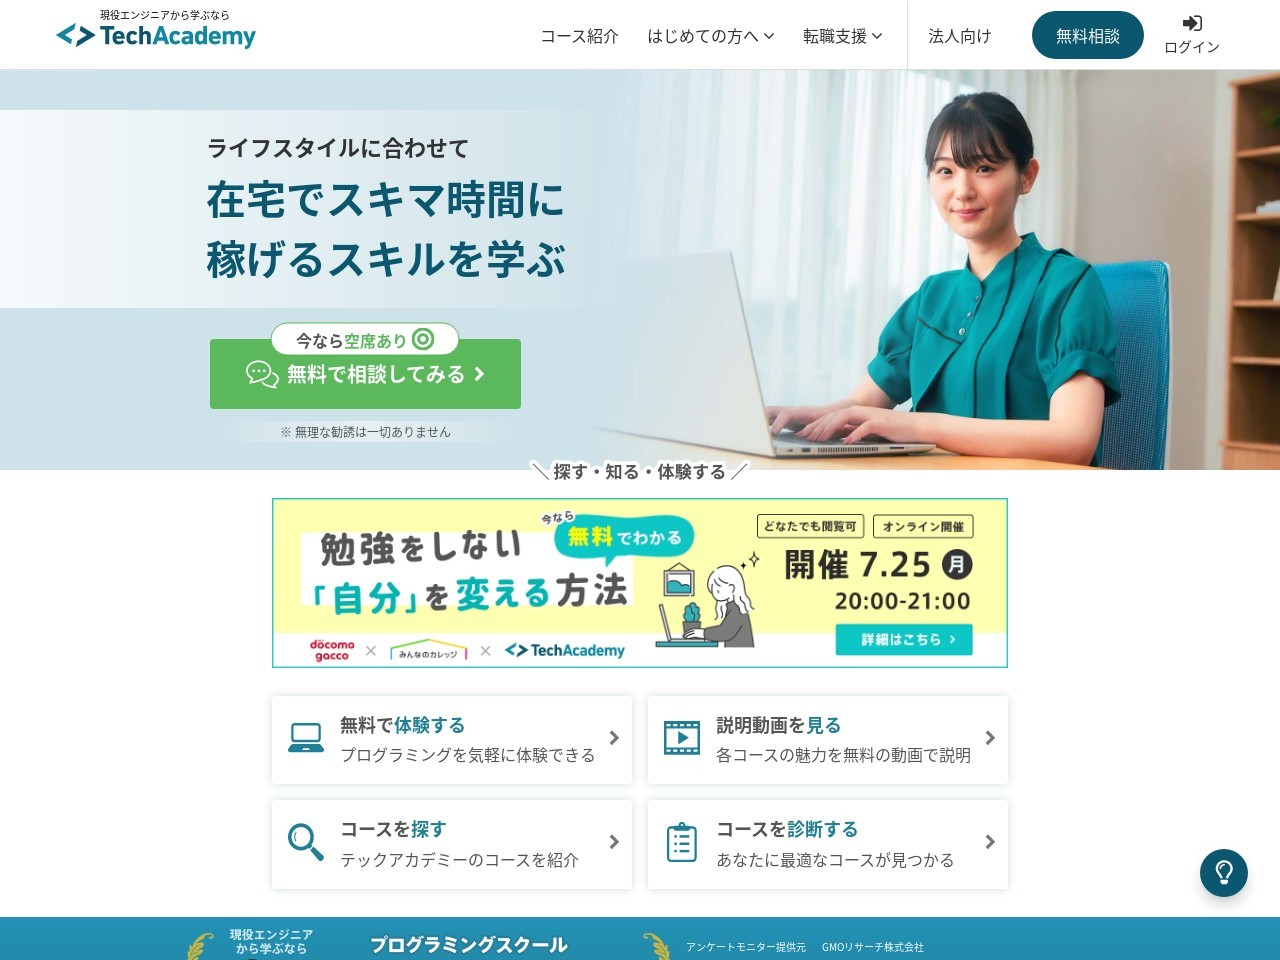 http://techacademy.jp/magazine/1384